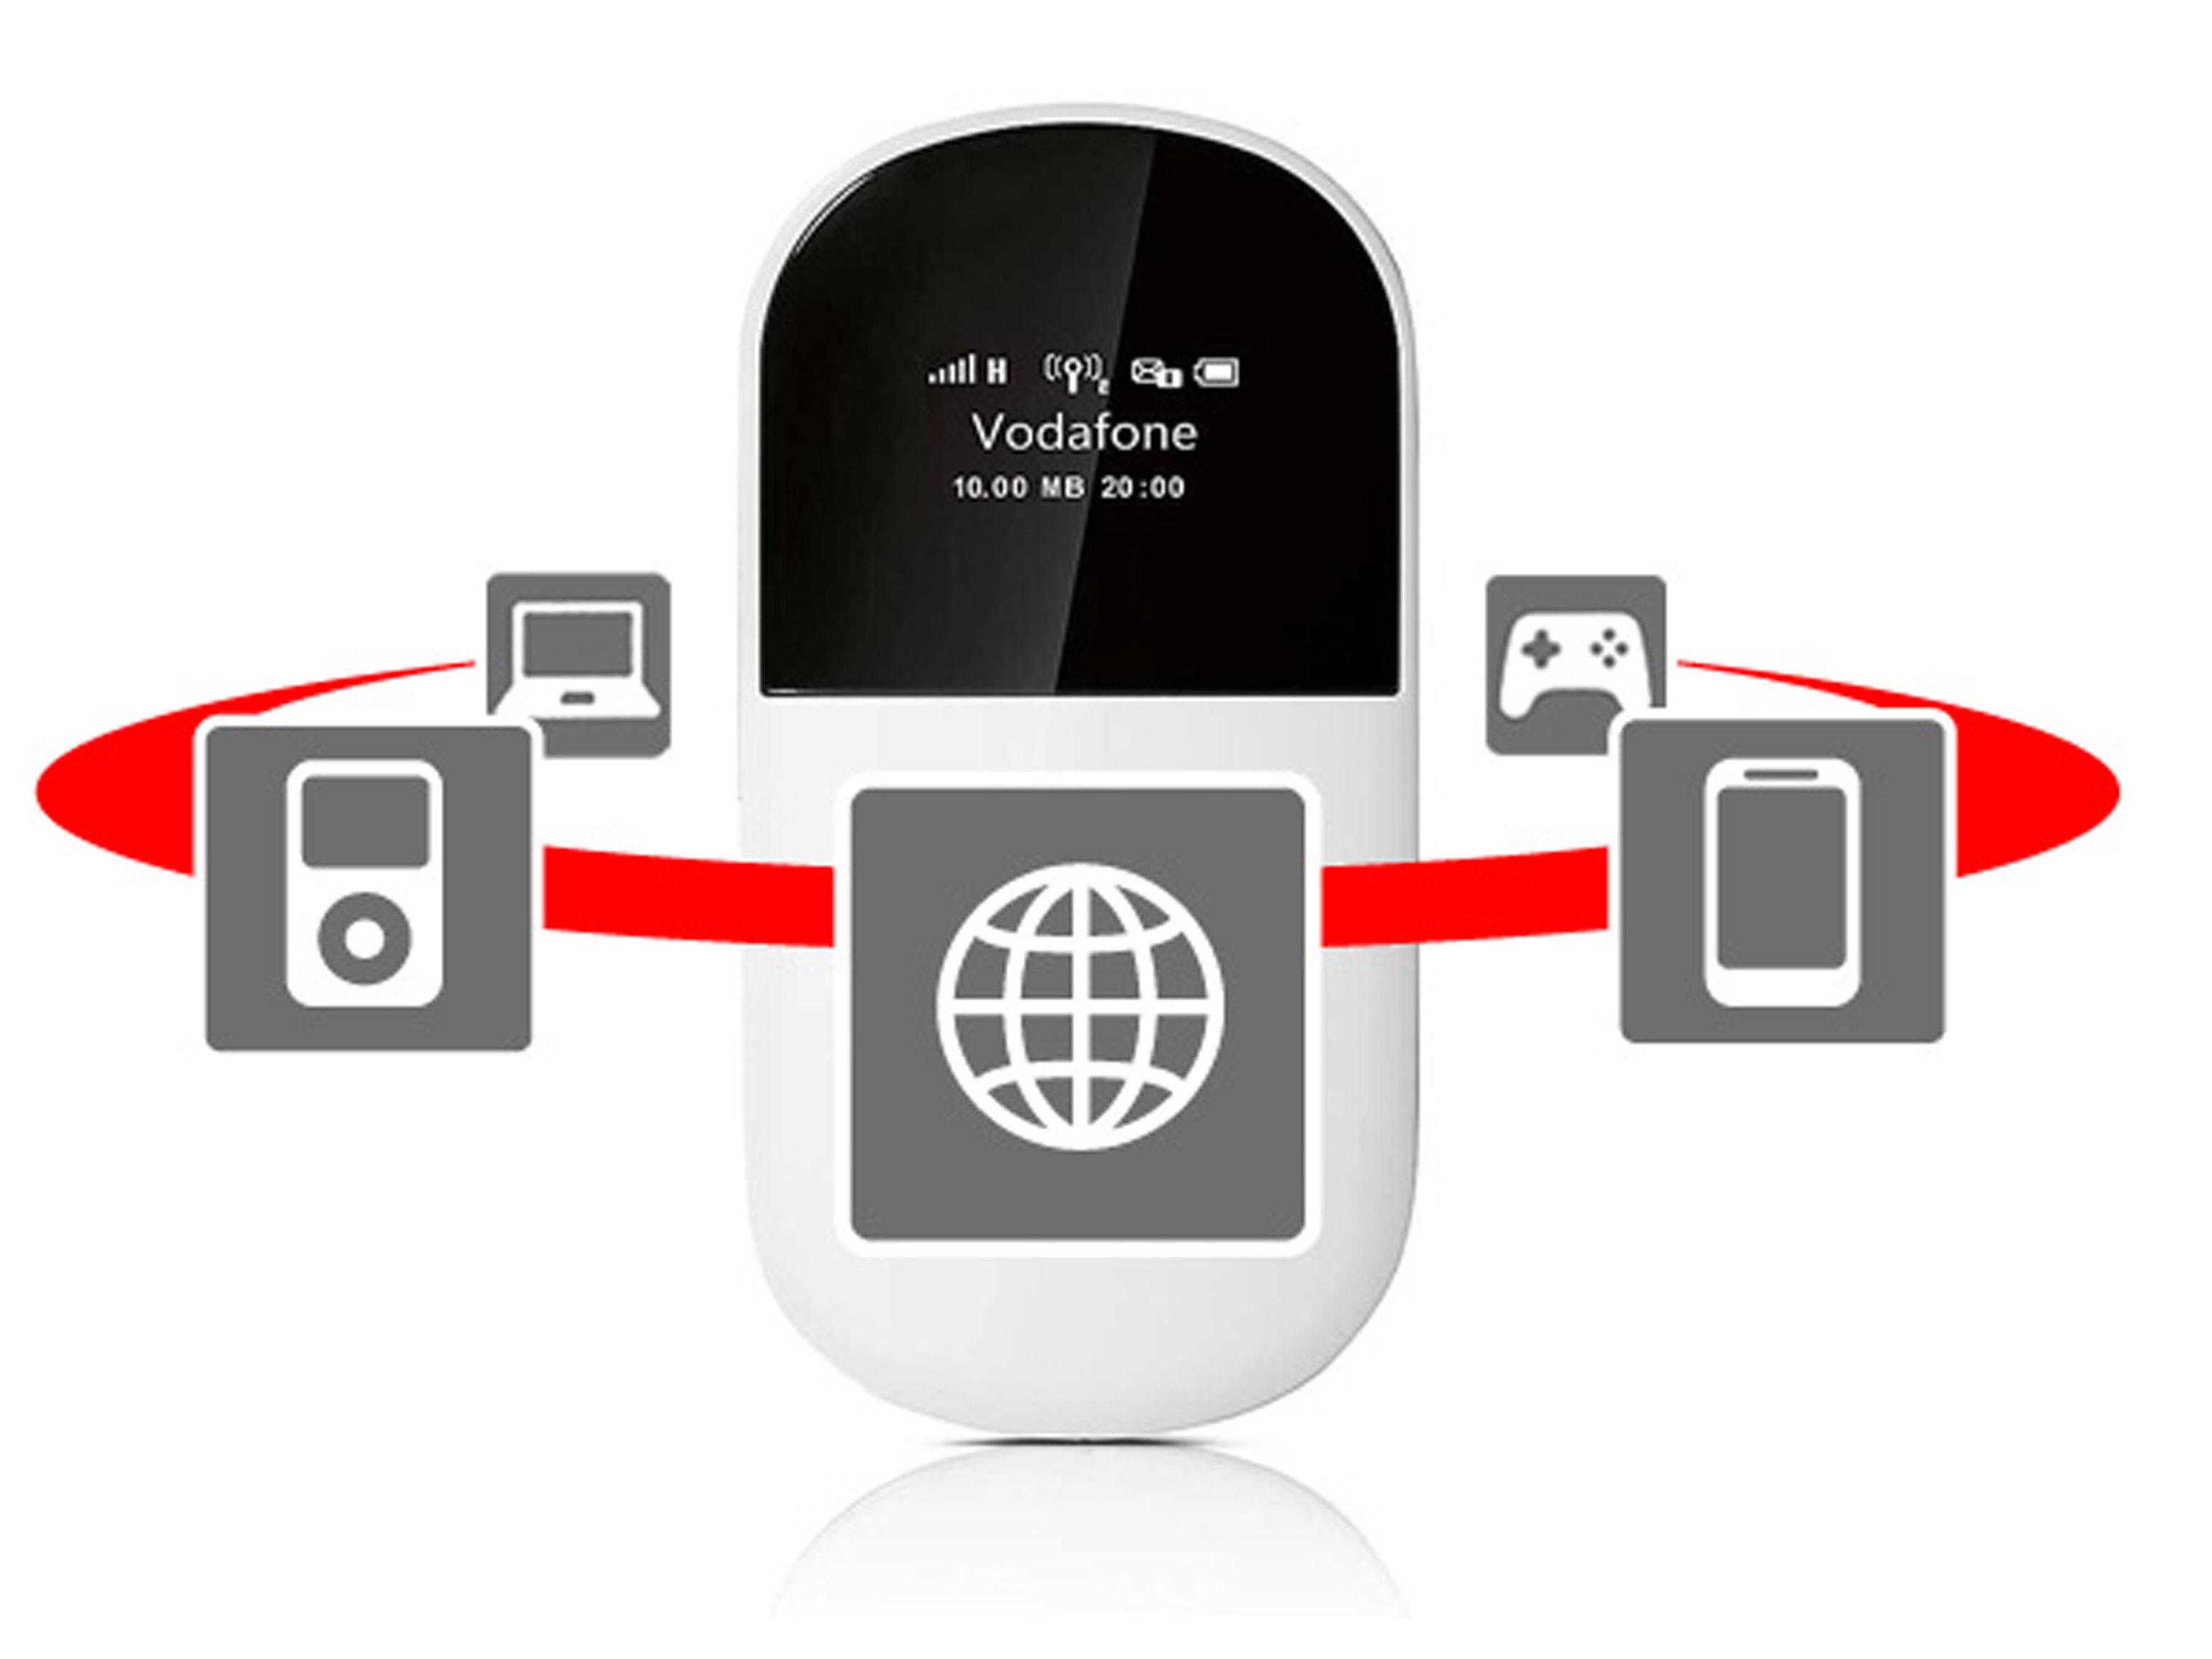 vodafone r205 pay as you go mobile wifi unit. Black Bedroom Furniture Sets. Home Design Ideas